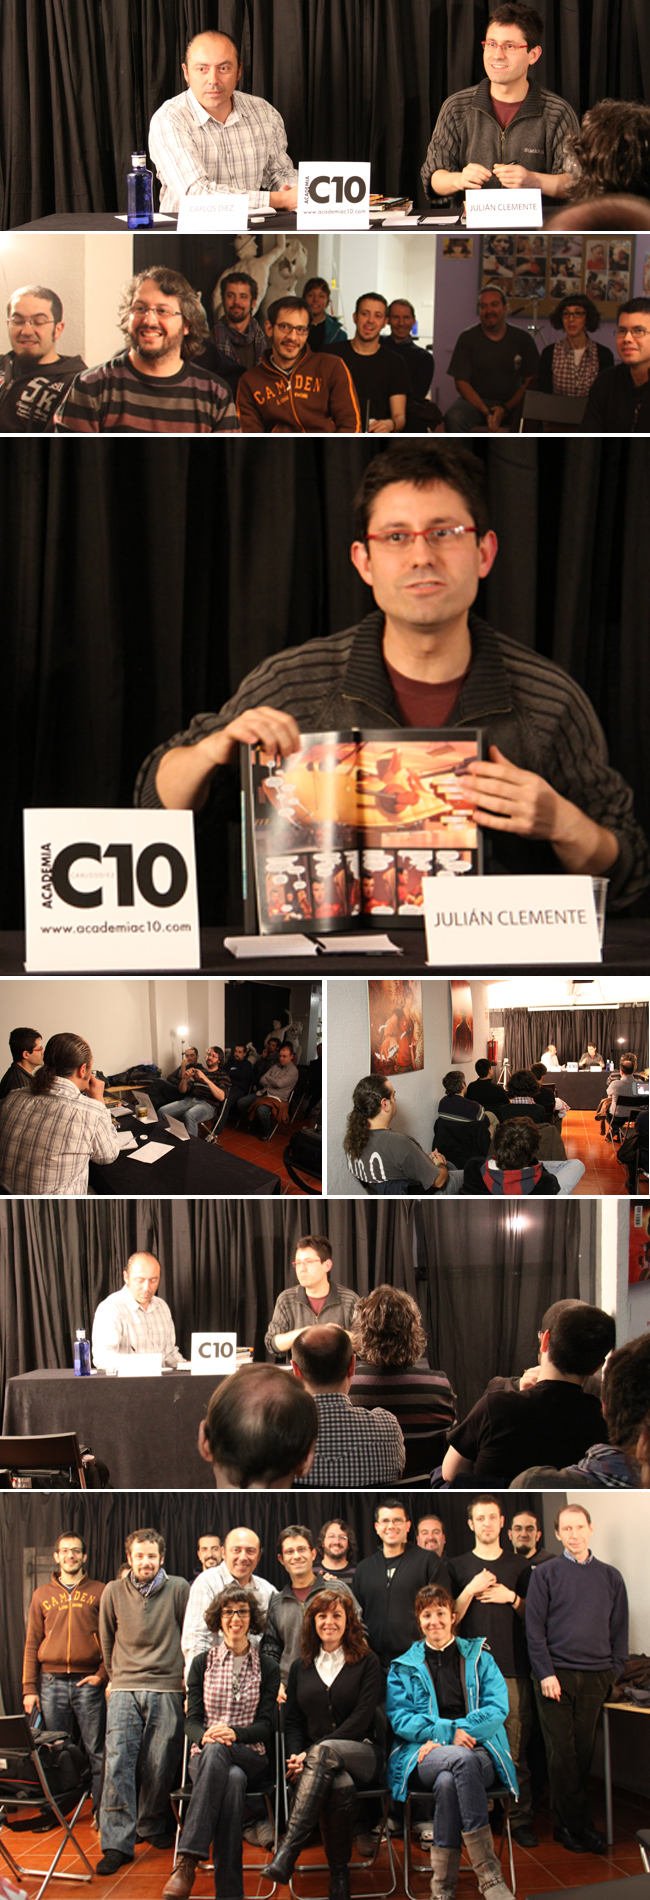 pastilla-julian-clemente-editor-marvel-comics-panini-dc-masterclass-academiac10